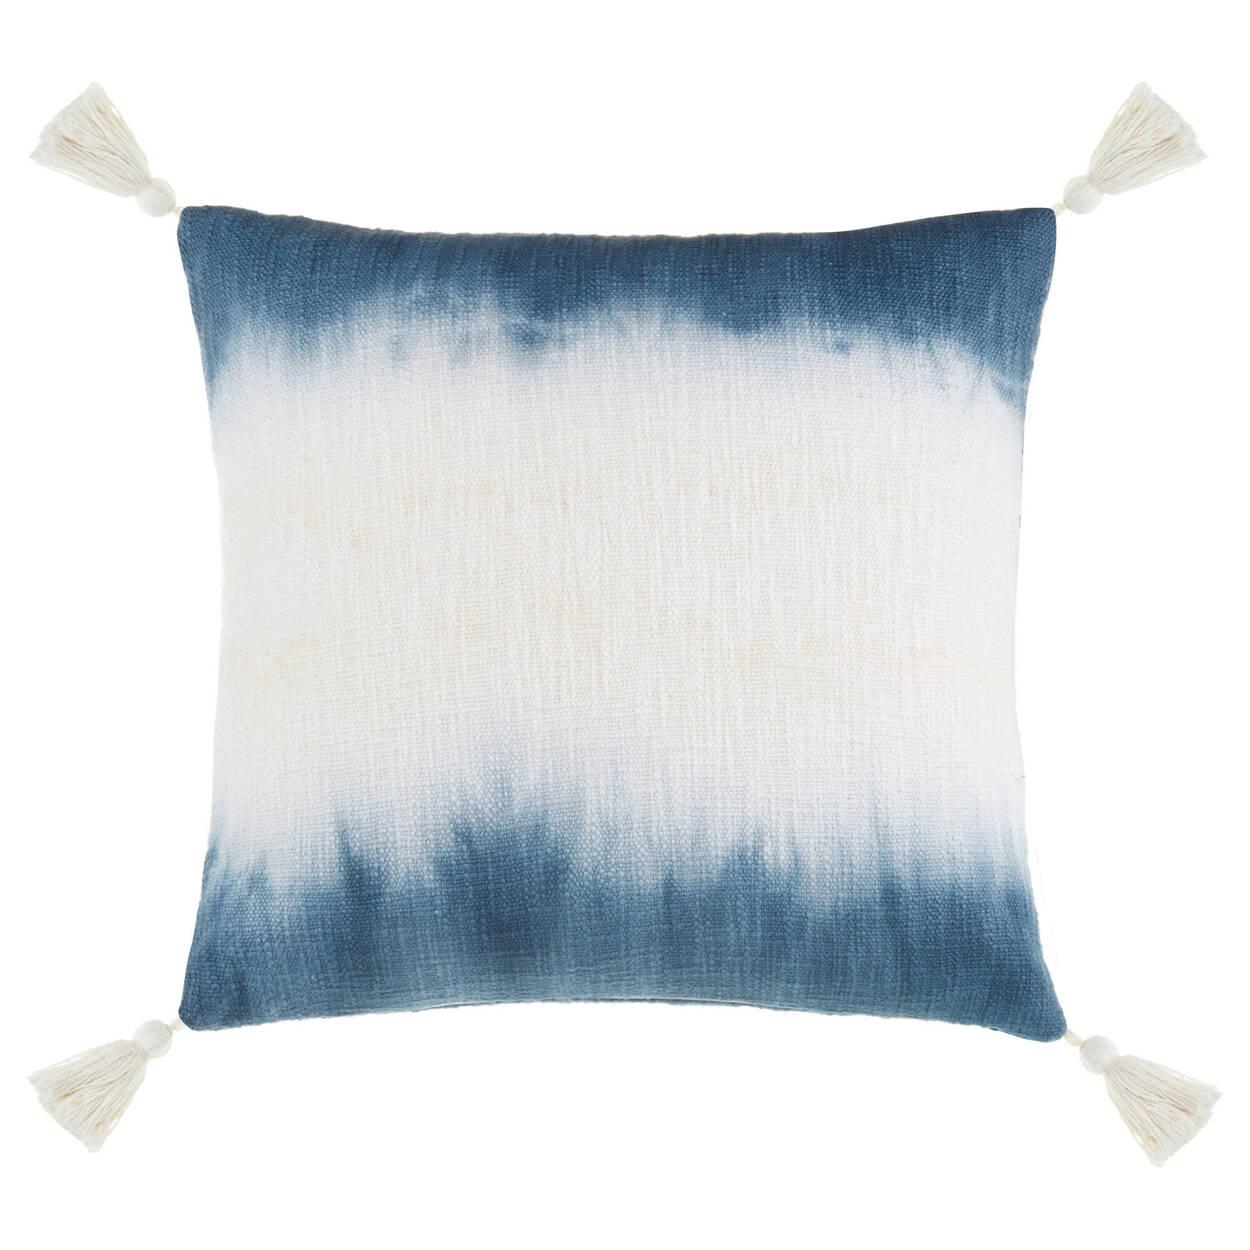 "Judy Tie-Dye Decorative Pillow 19"" x 19"""